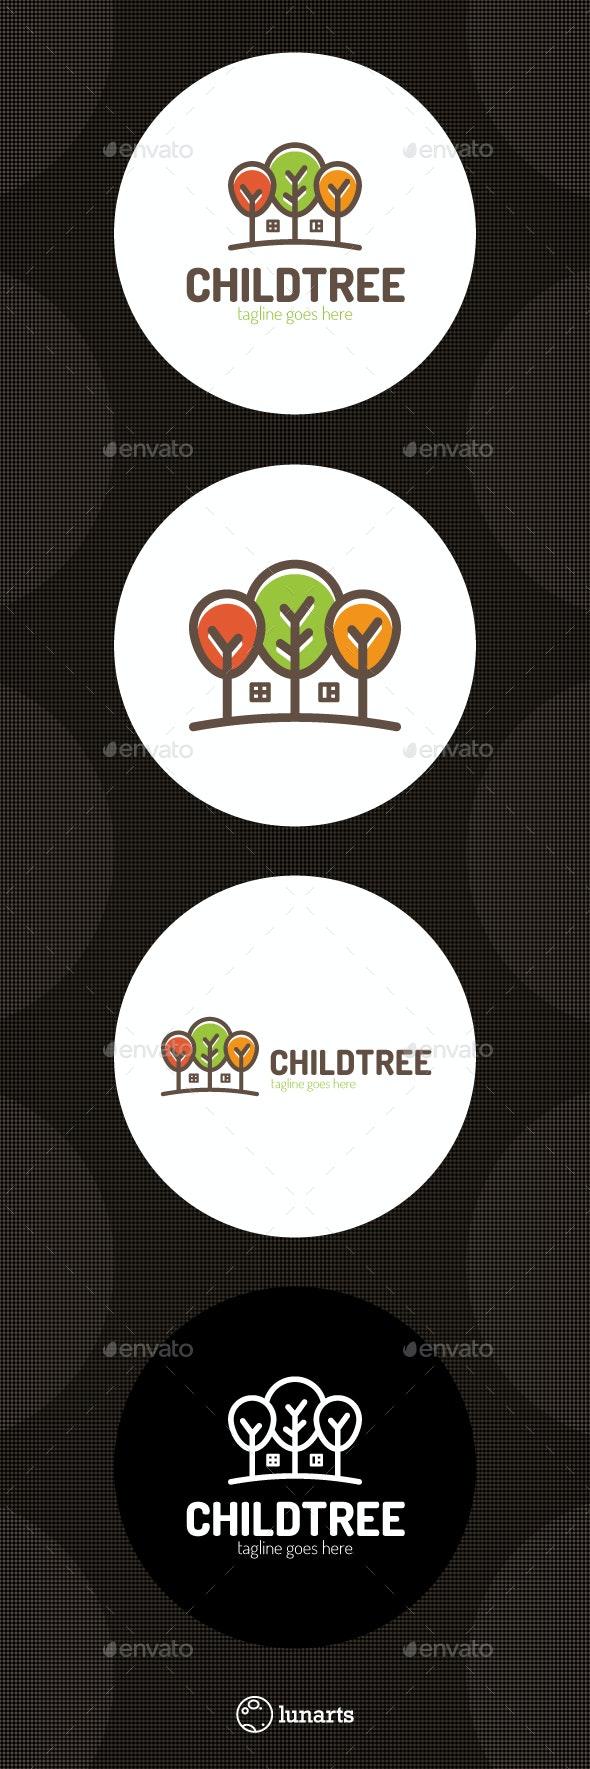 Tree House Logo - Children Home - Nature Logo Templates